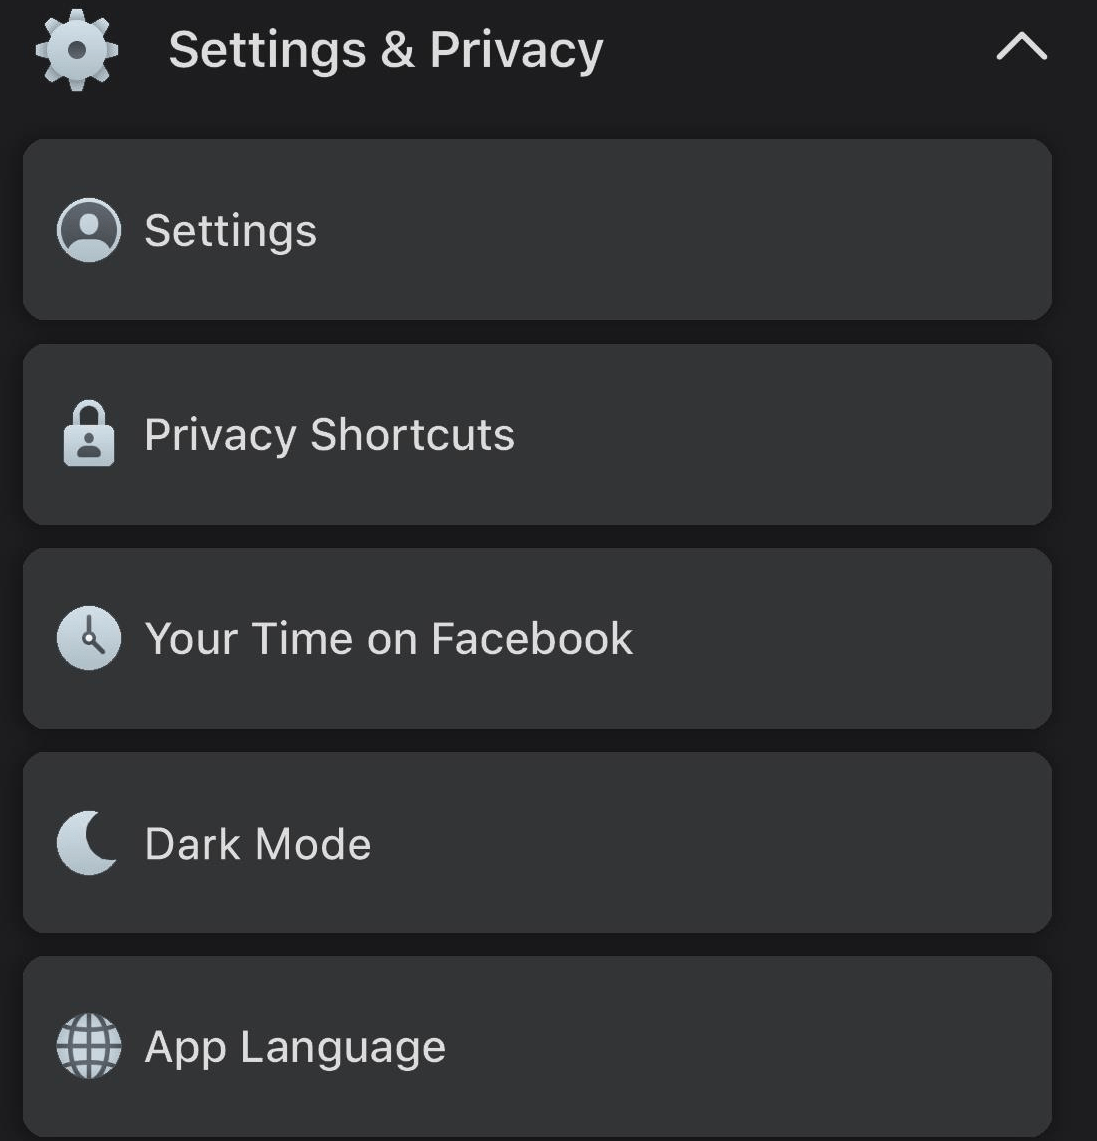 Facebook Dark Mode on Android Method 2020